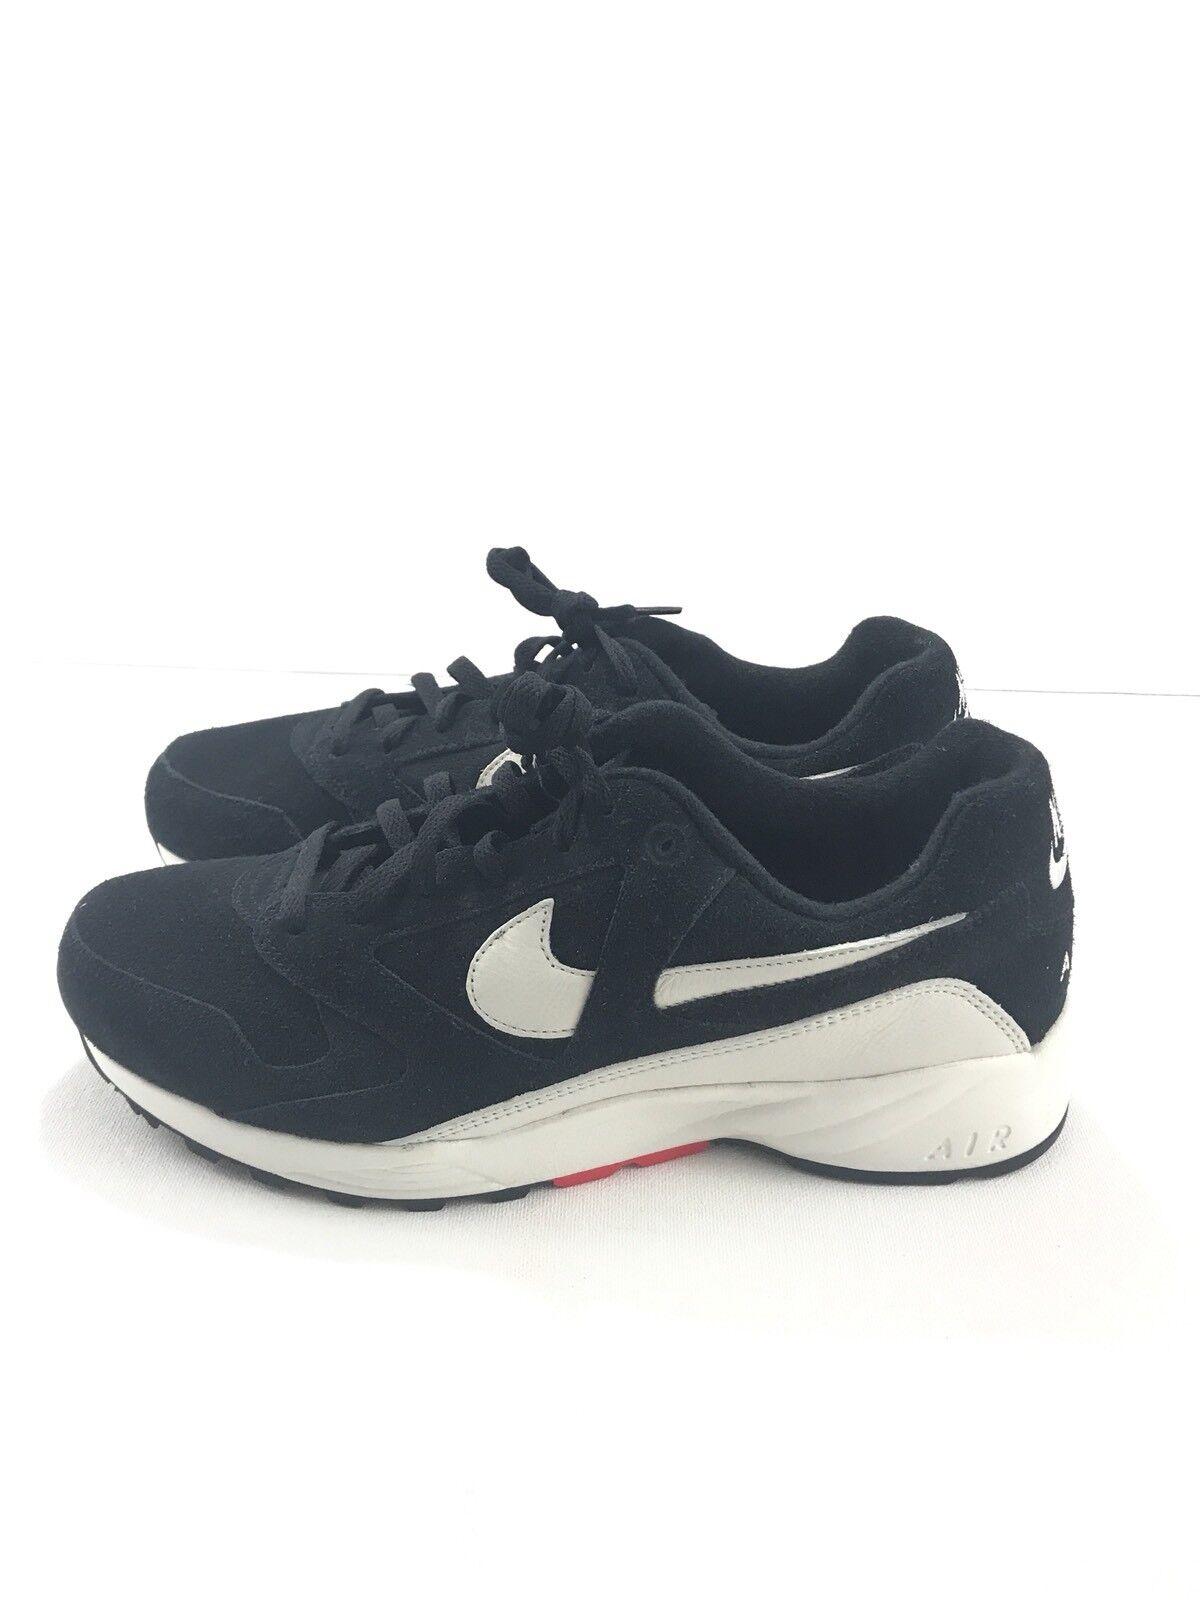 Nike air icarus in qs vela nera scarpe bianche dimensioni